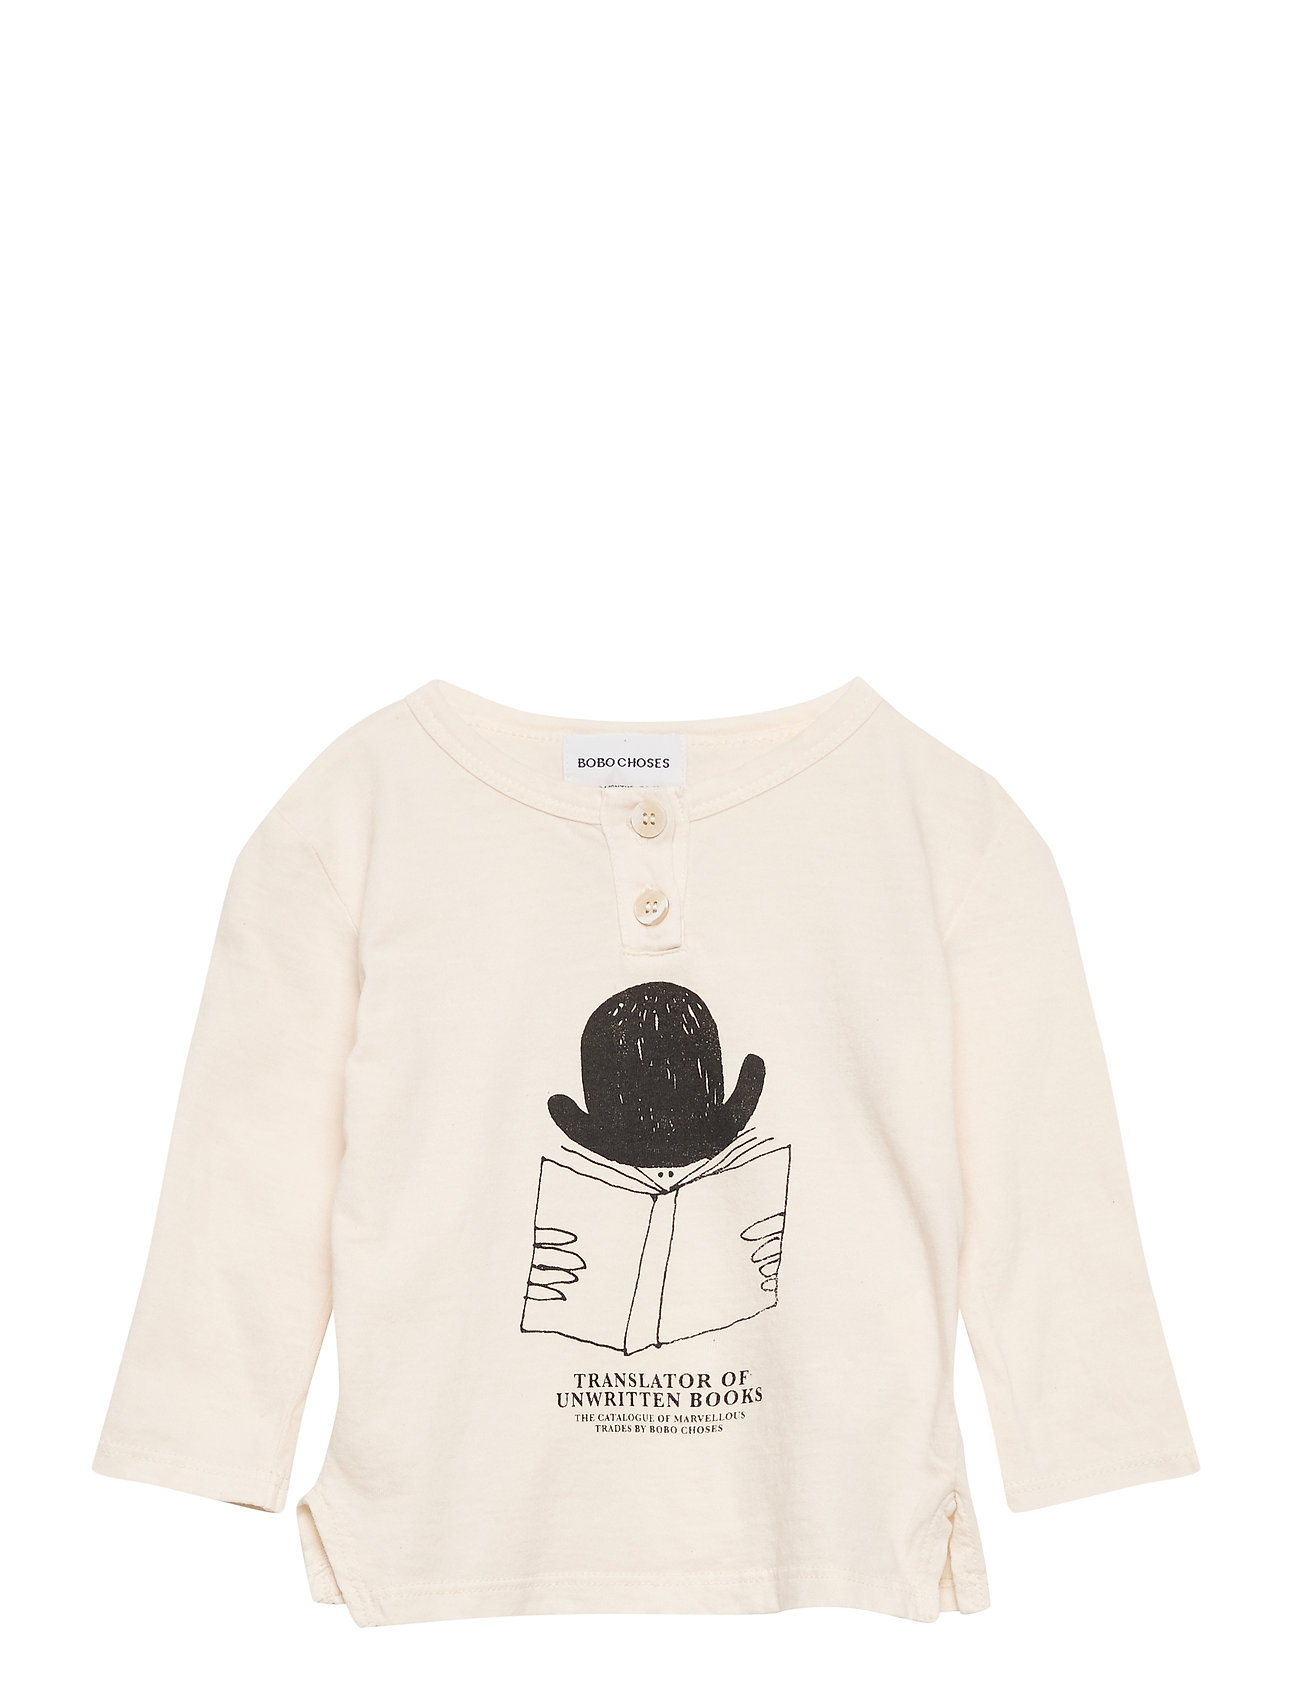 Image of Translator Buttonned T-Shirt Langærmet T-shirt Creme Bobo Choses (3433040859)